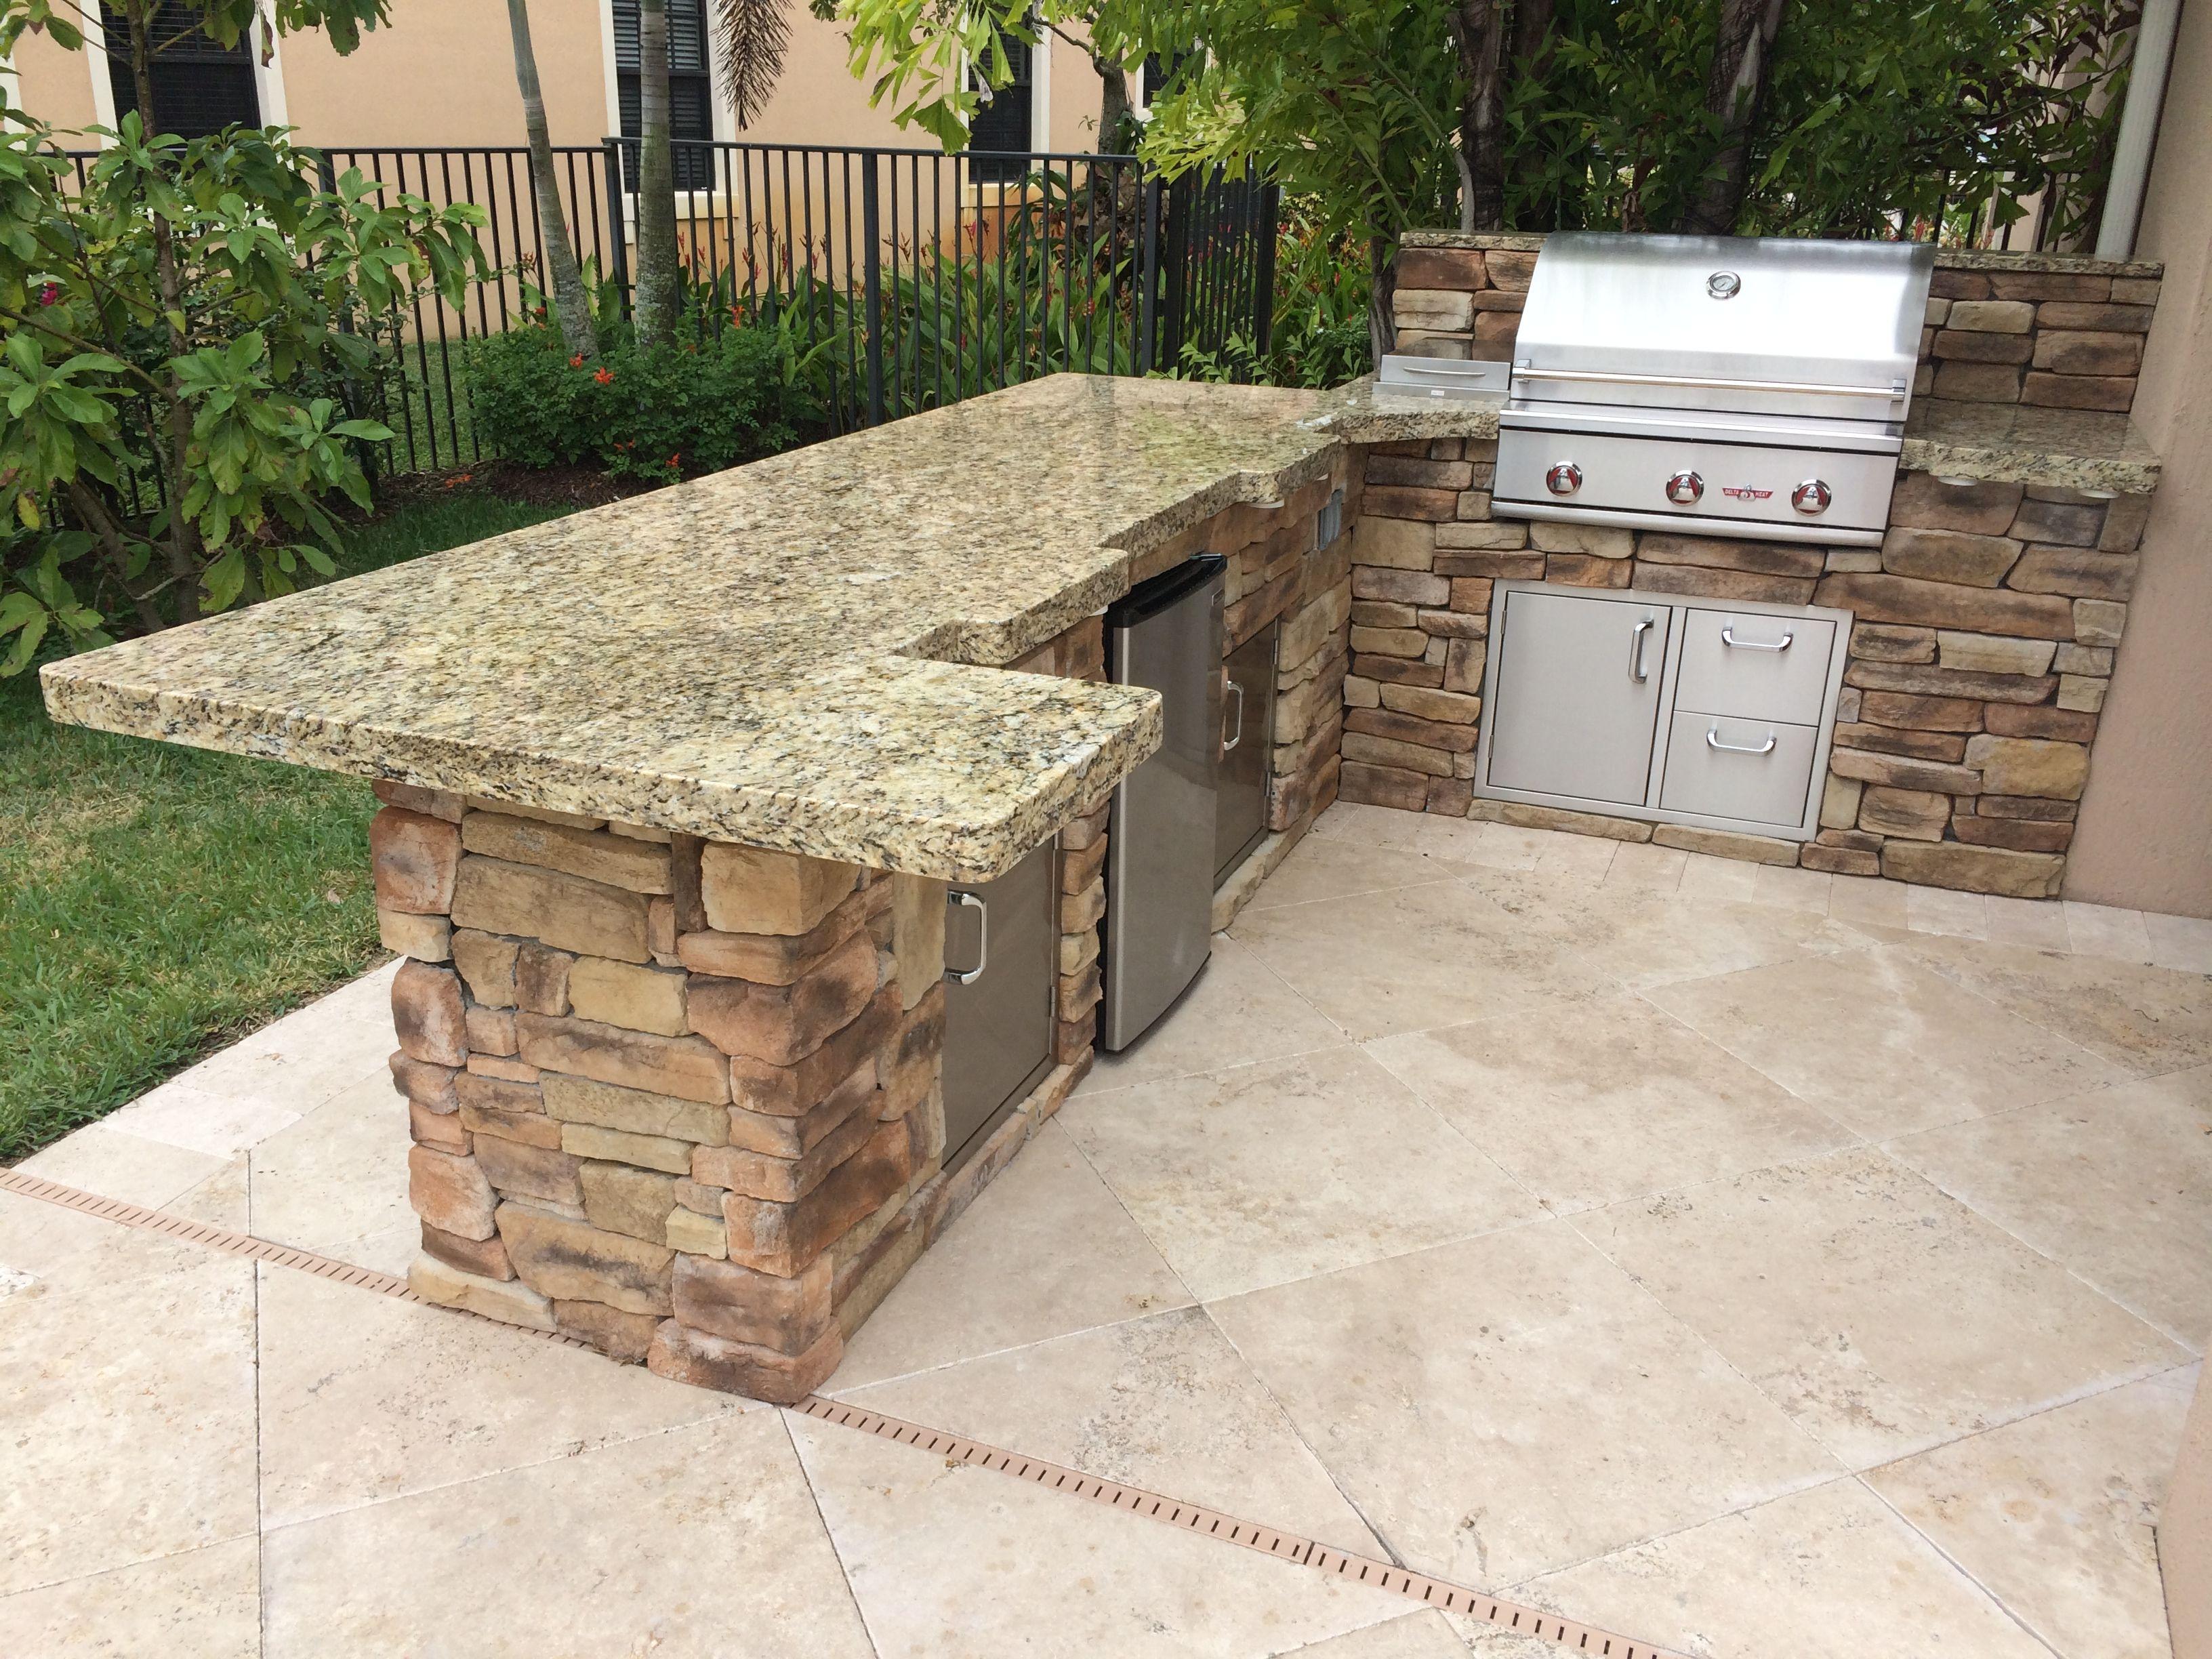 Custom Delta Heat Outdoor Kitchen With Refrigerator Rock Finish And Granite Top Outdoor Kitchen Grill Outdoor Kitchen Kitchen Grill